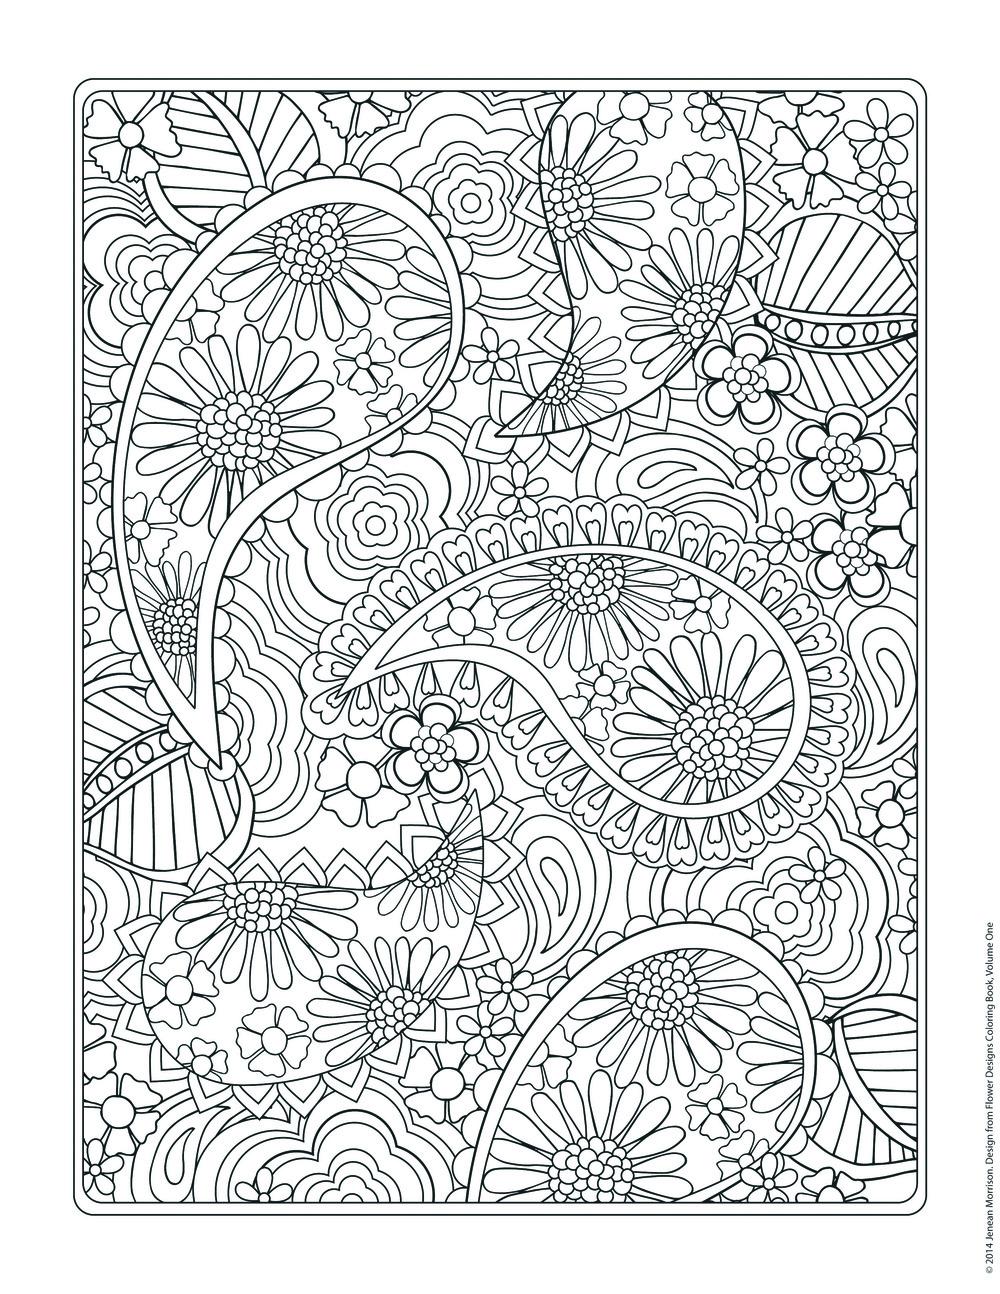 Design Coloring Pages Pdf : Flower designs coloring book — jenean morrison art design